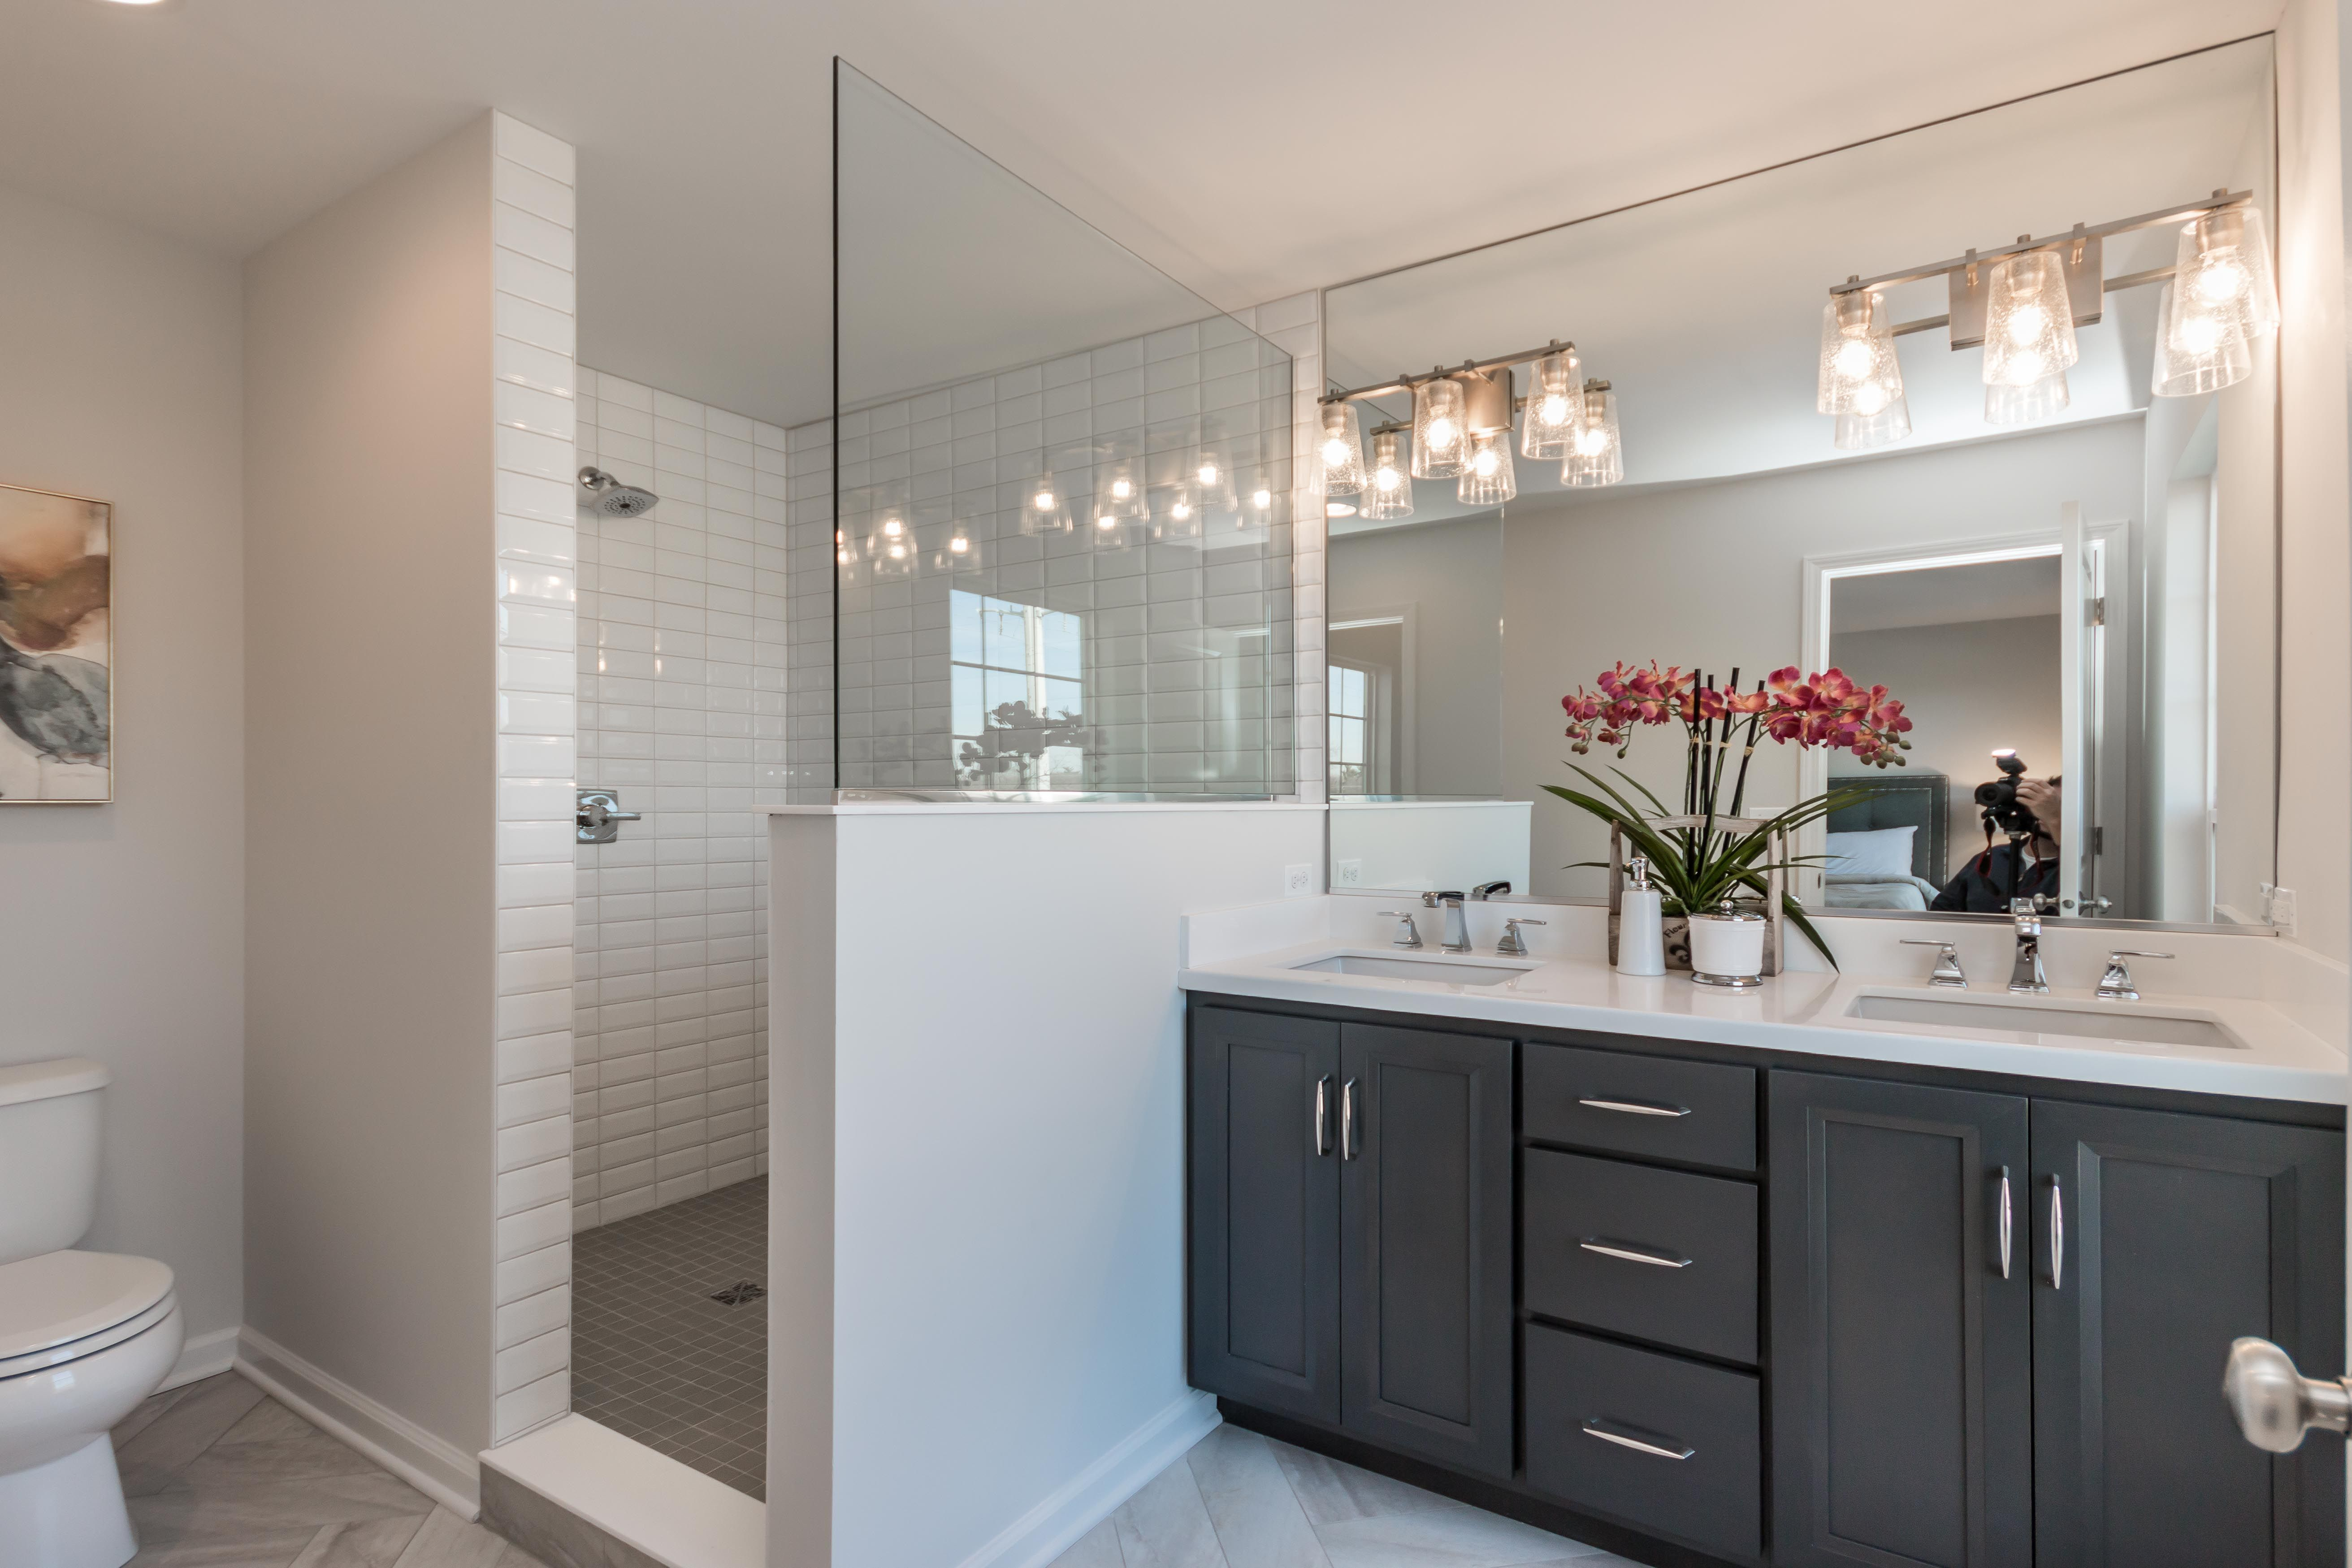 Cottage Style Bathroom Design Cottage Style Bathrooms Bathroom Design Custom Home Designs